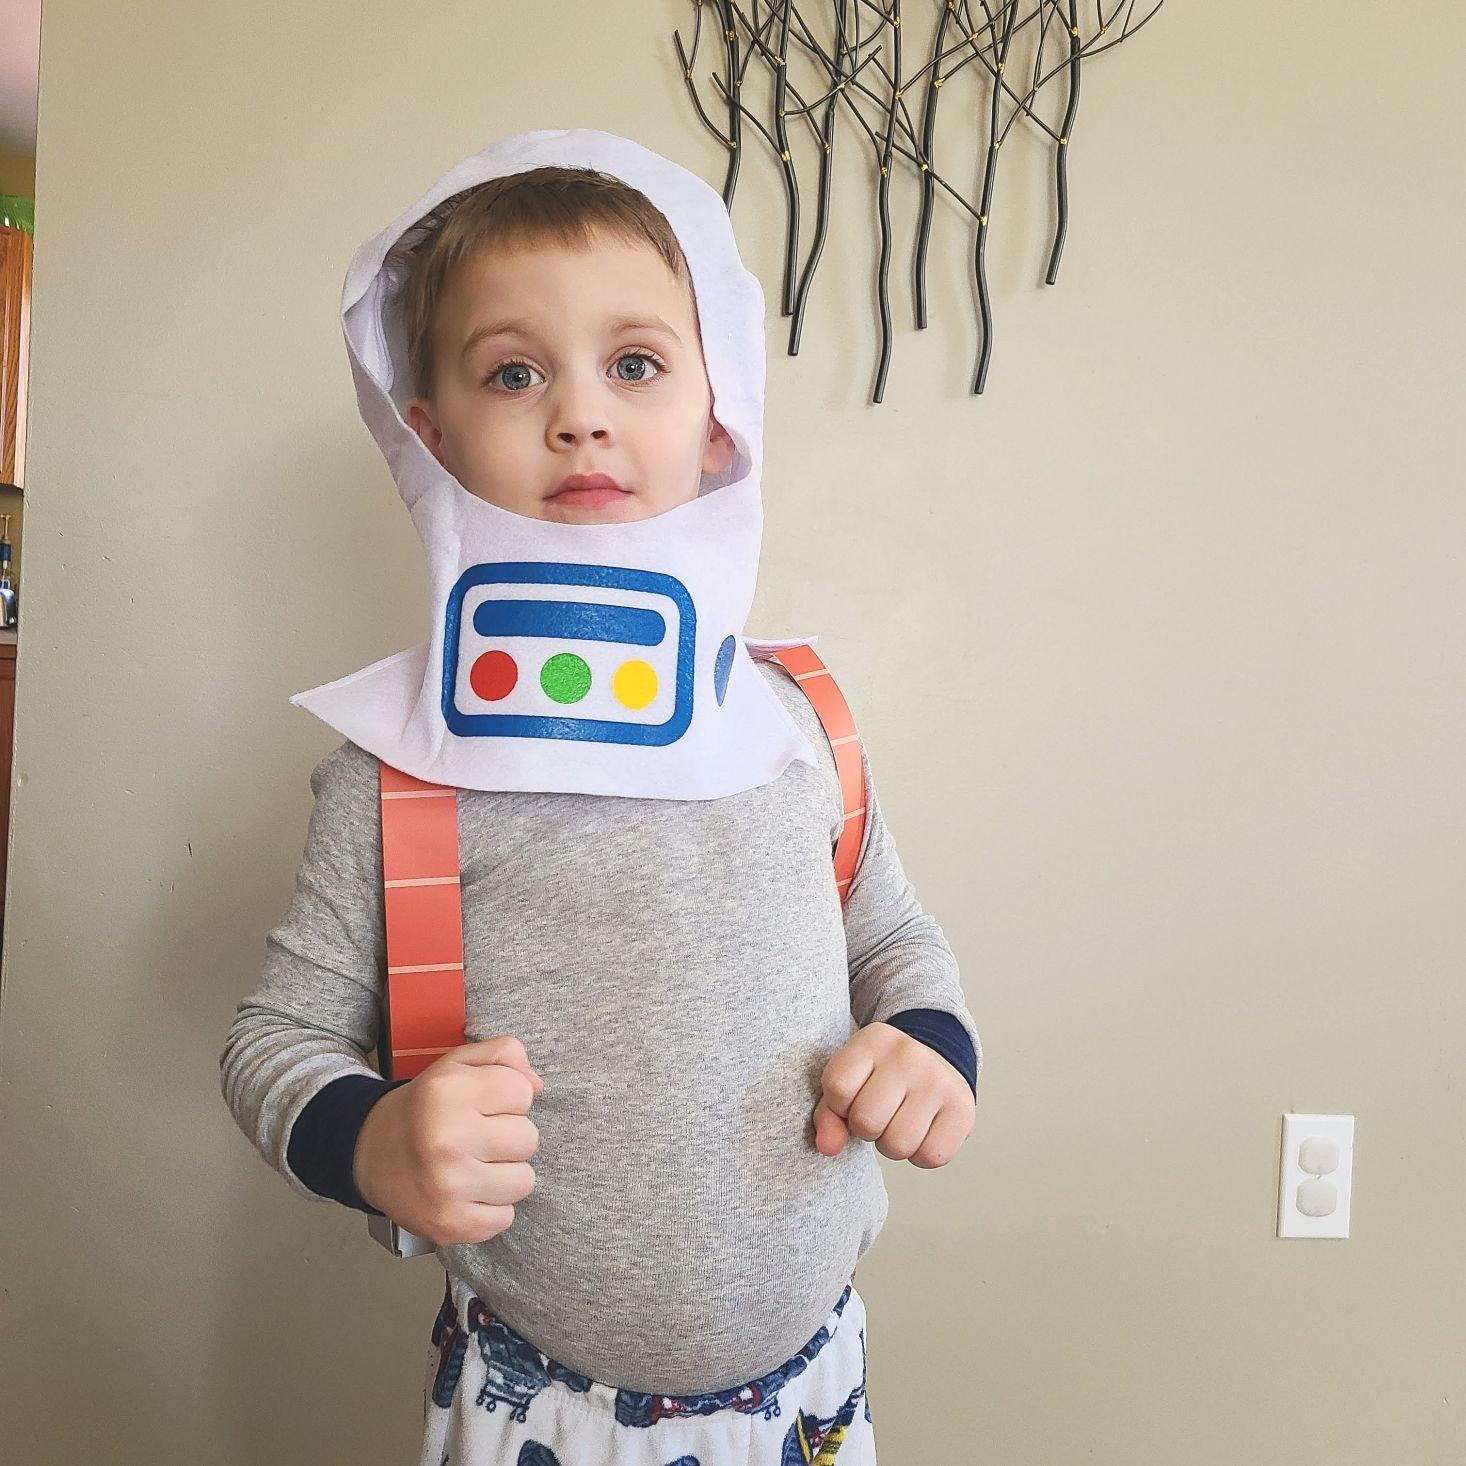 Sago Mini Box March 2021 astronaut helmet